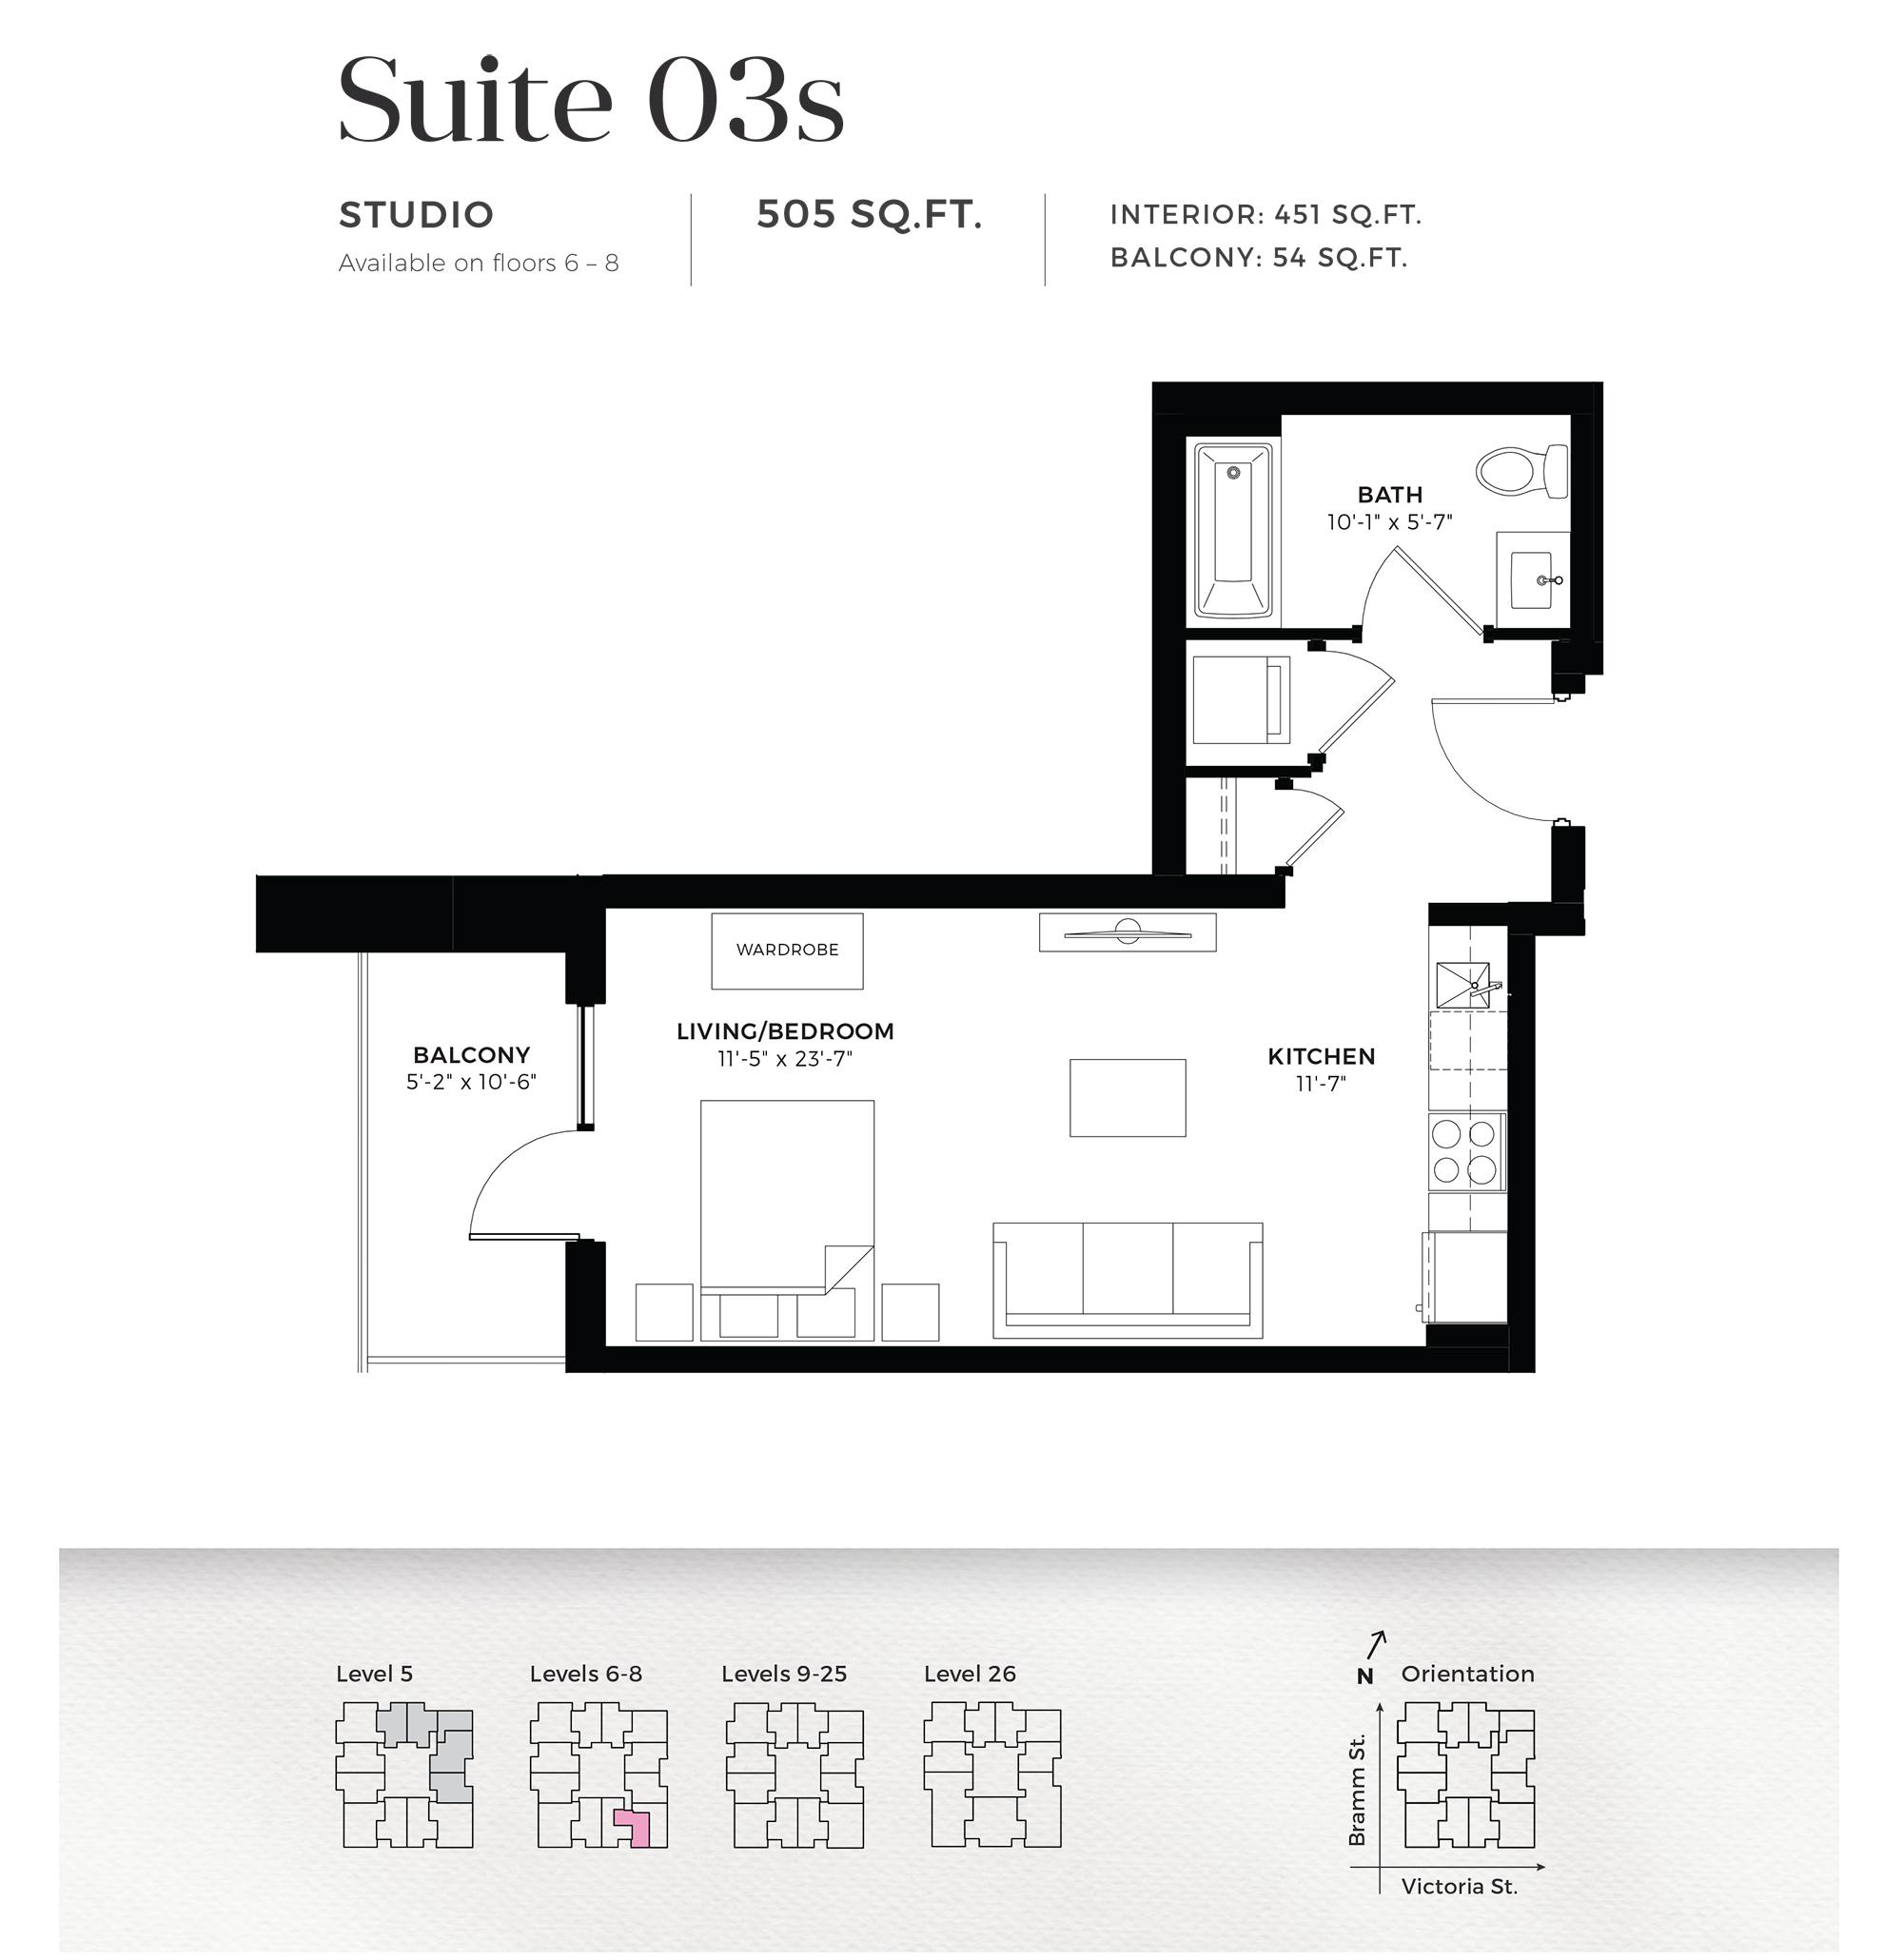 Suite 03s